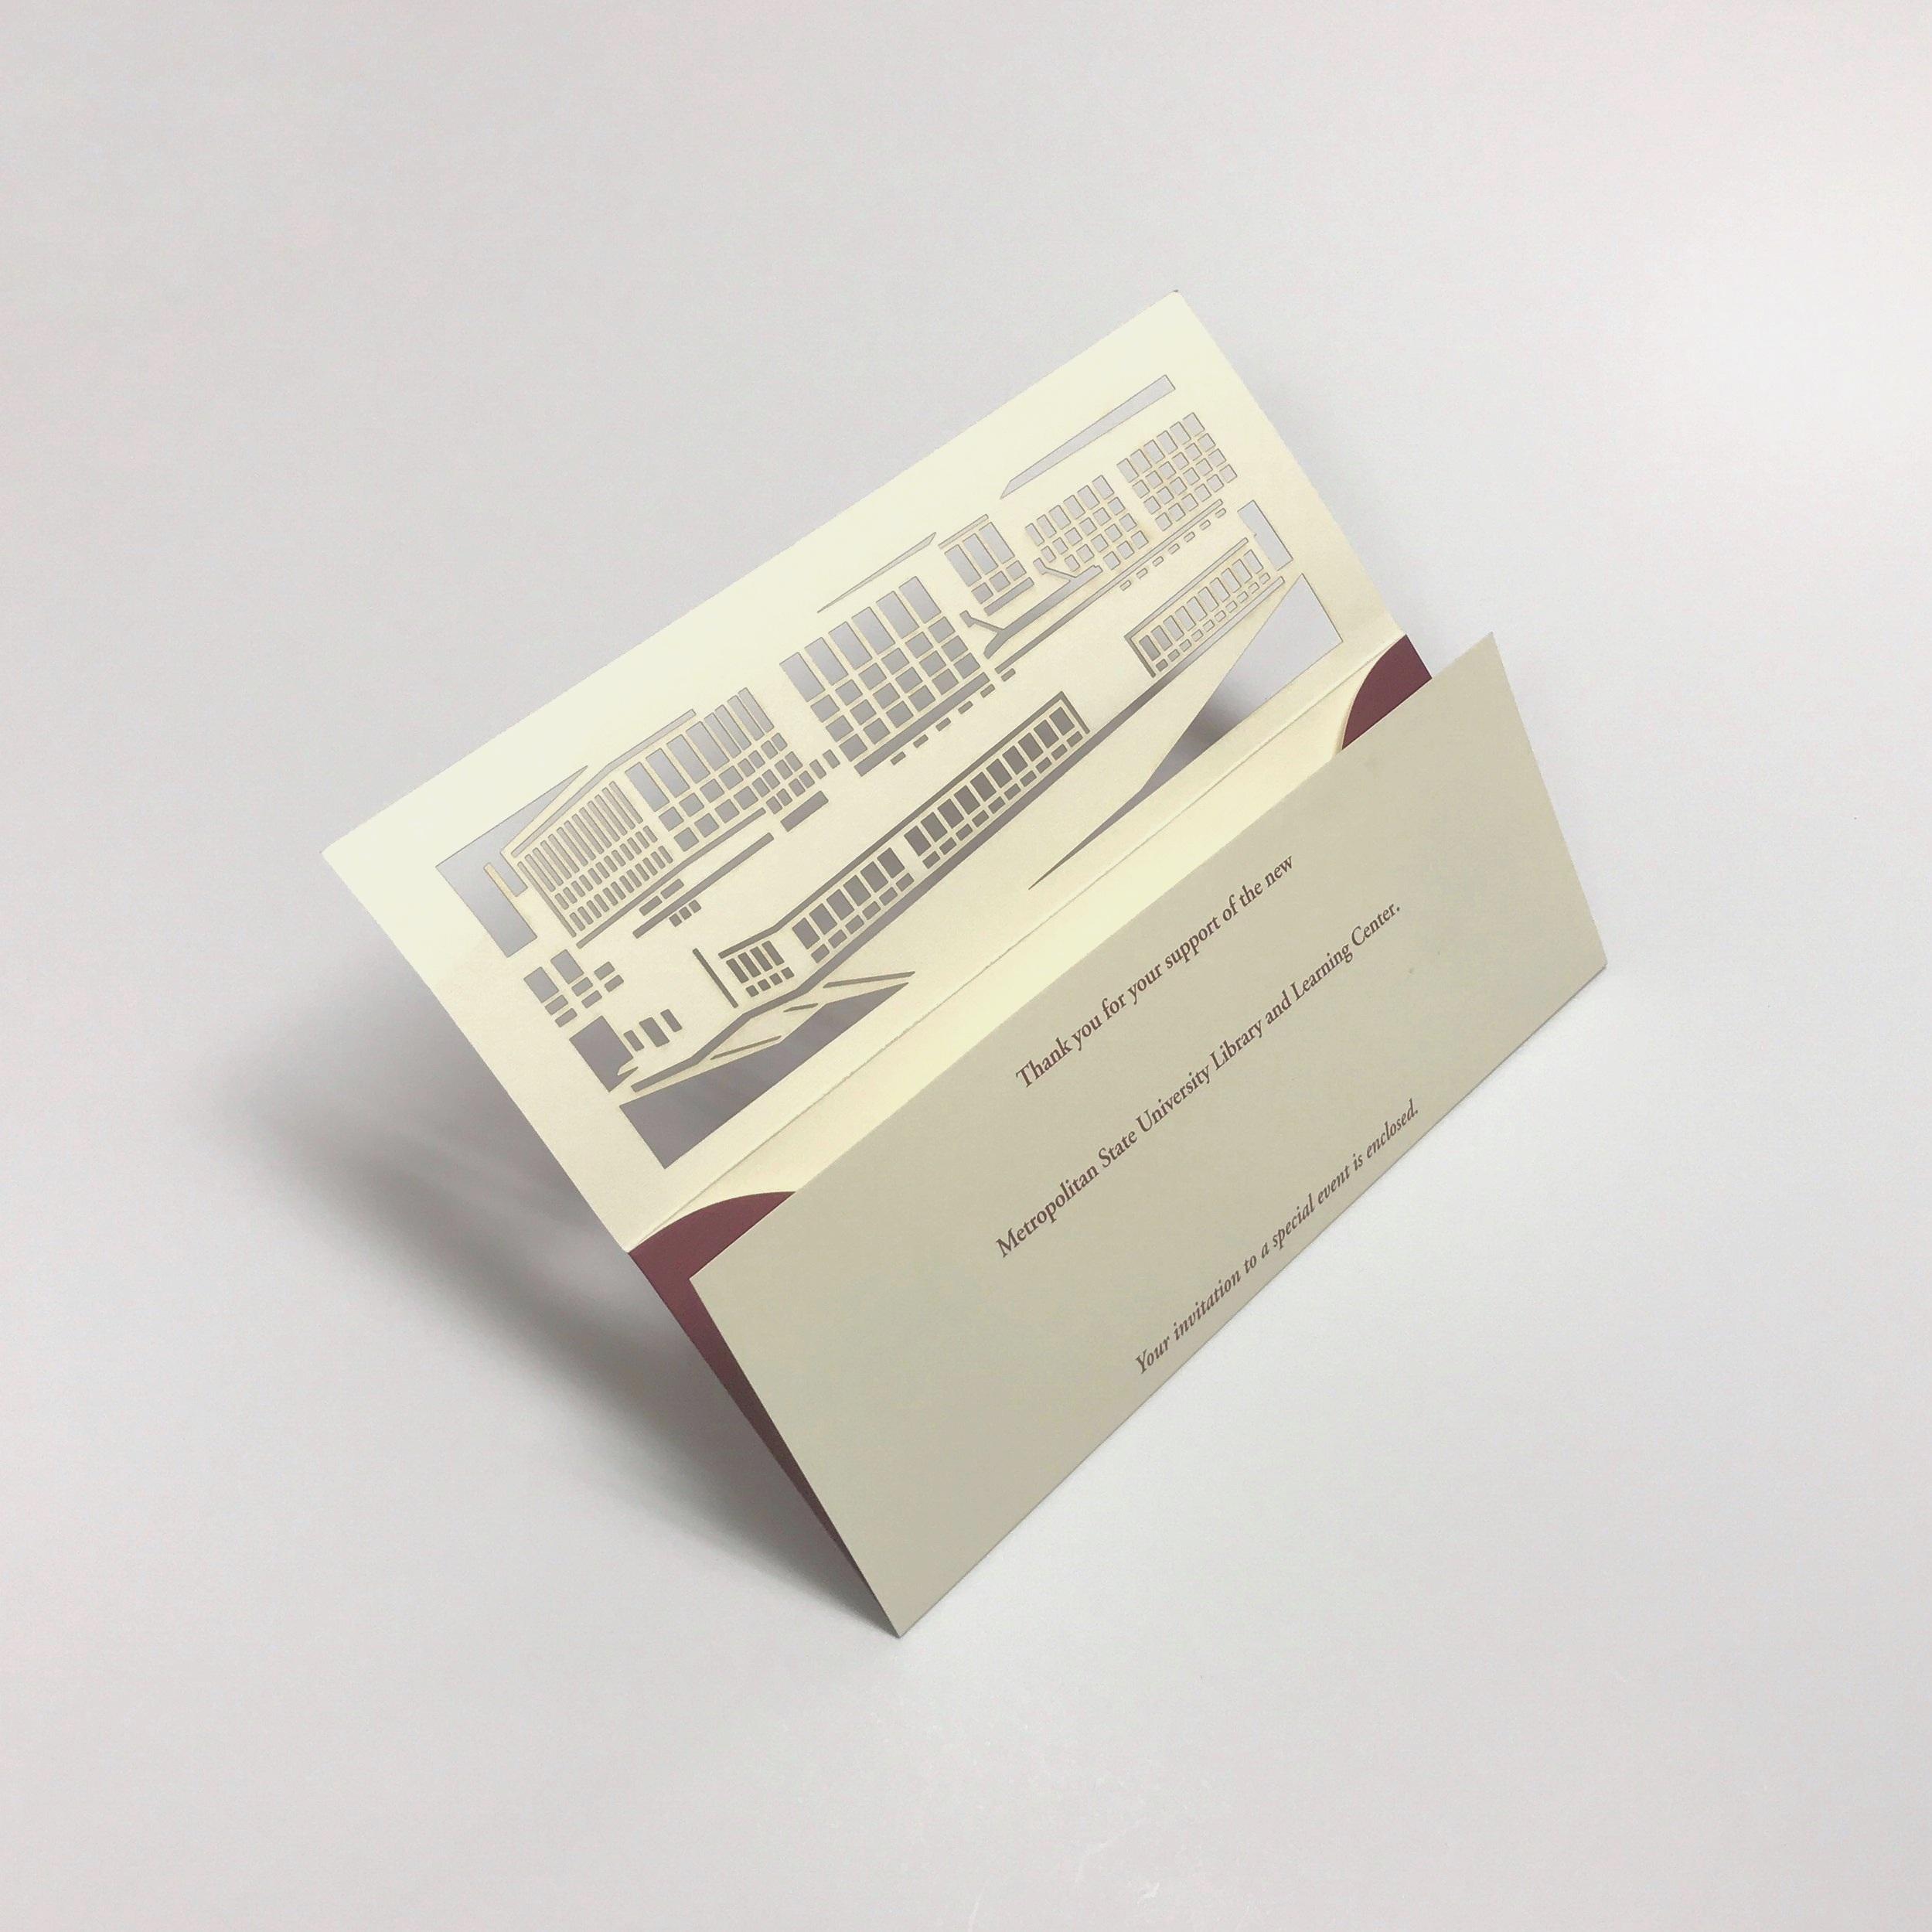 High quality die cut invitation printed in Minnesota